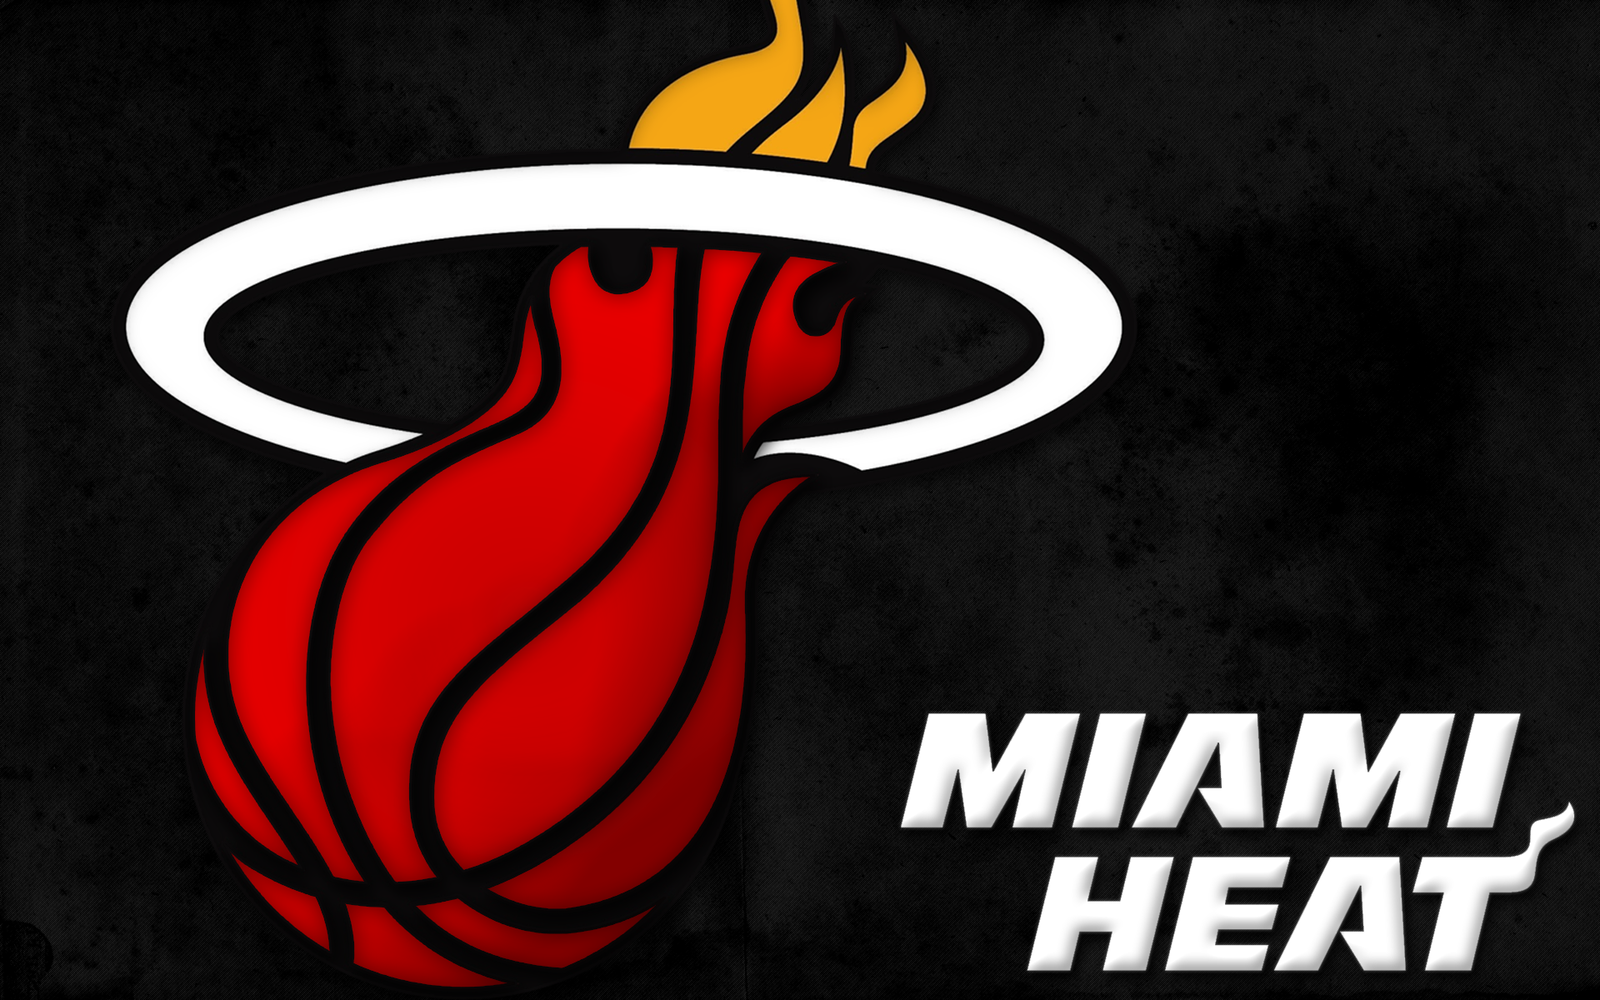 Miami Heat by lucasitodesign 1600x1000